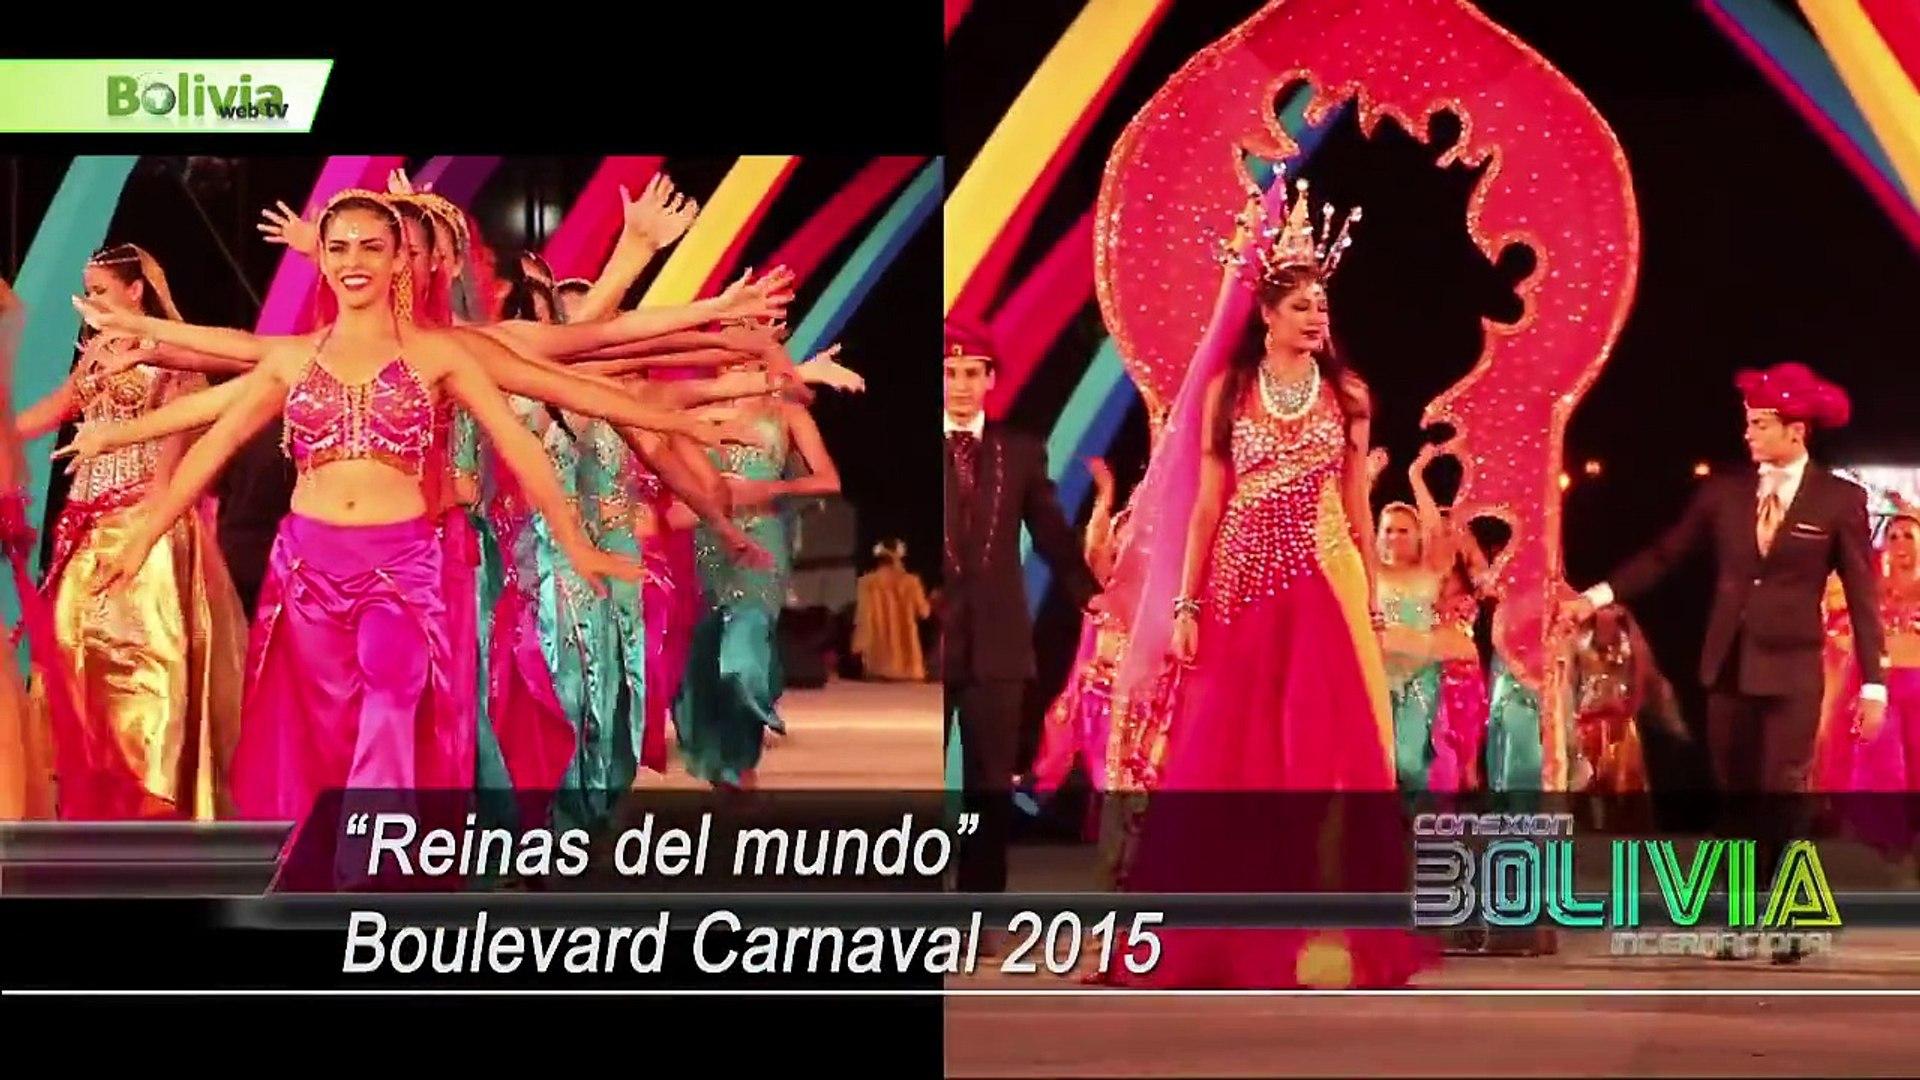 CONEXION Boulevard Carnaval